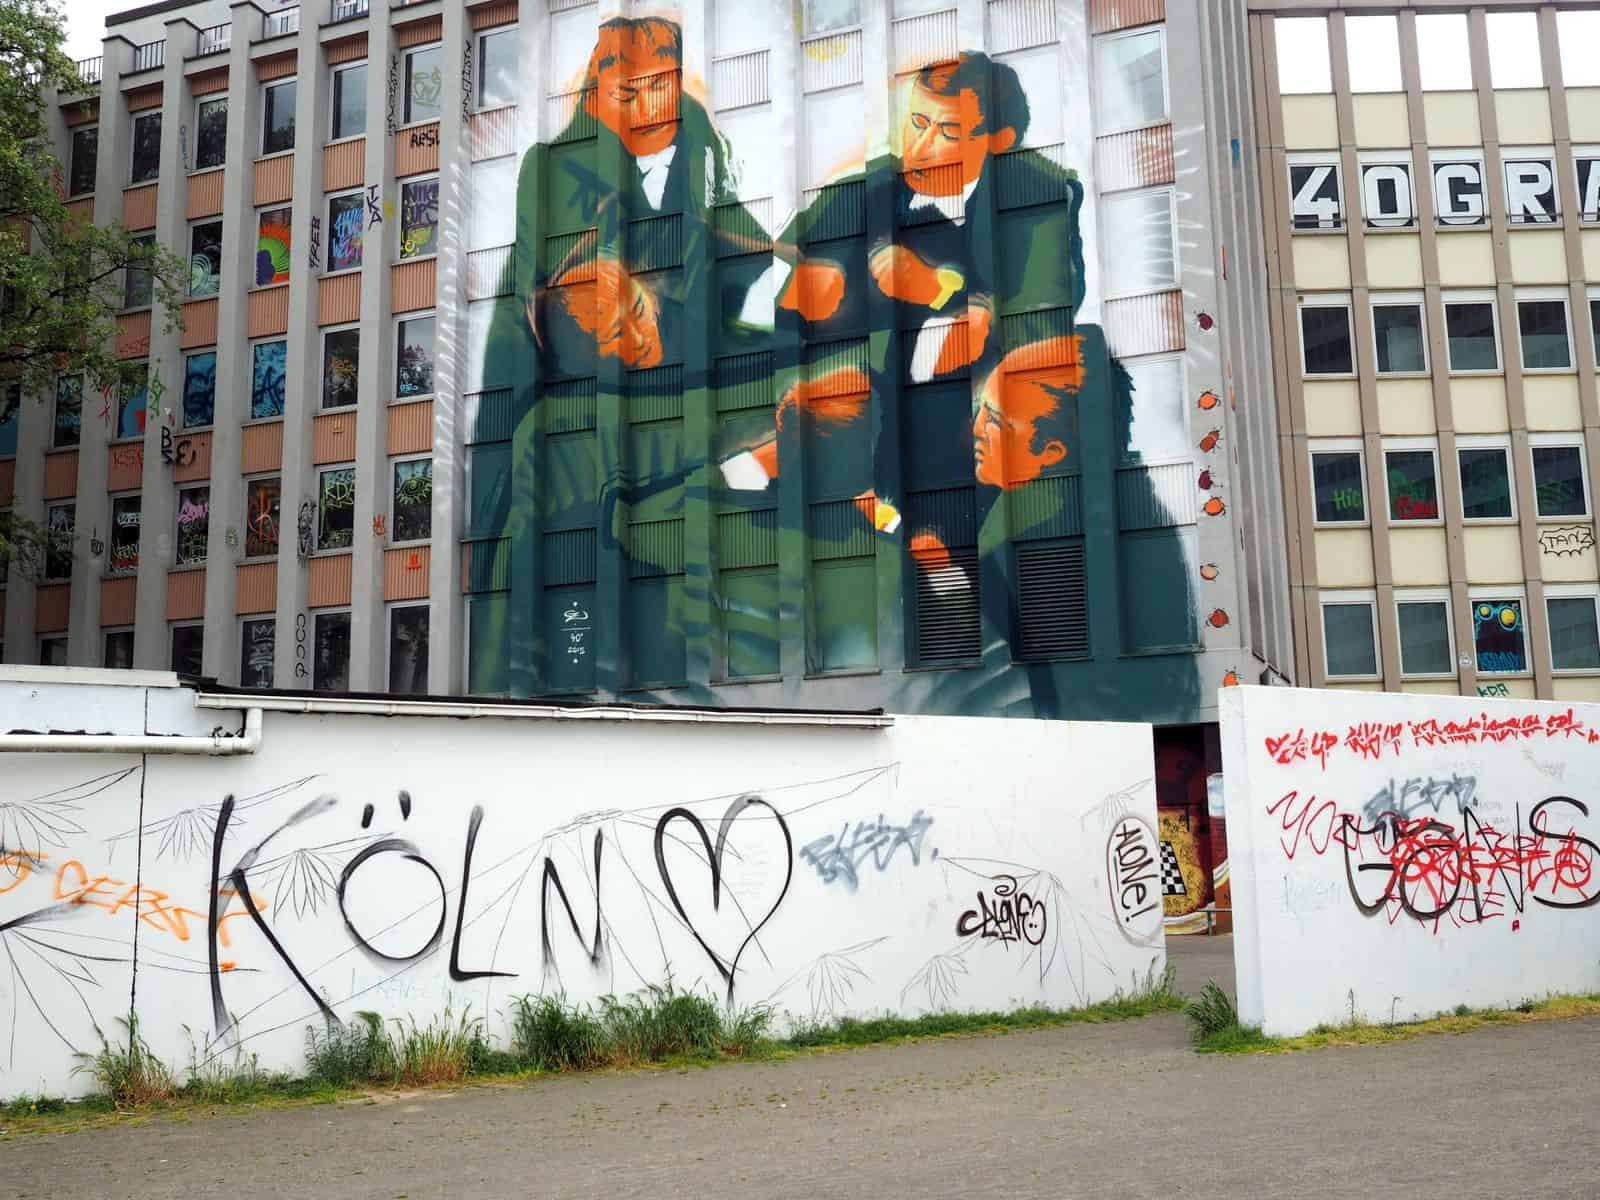 BdW28: Graffito am Gründgens-Platz